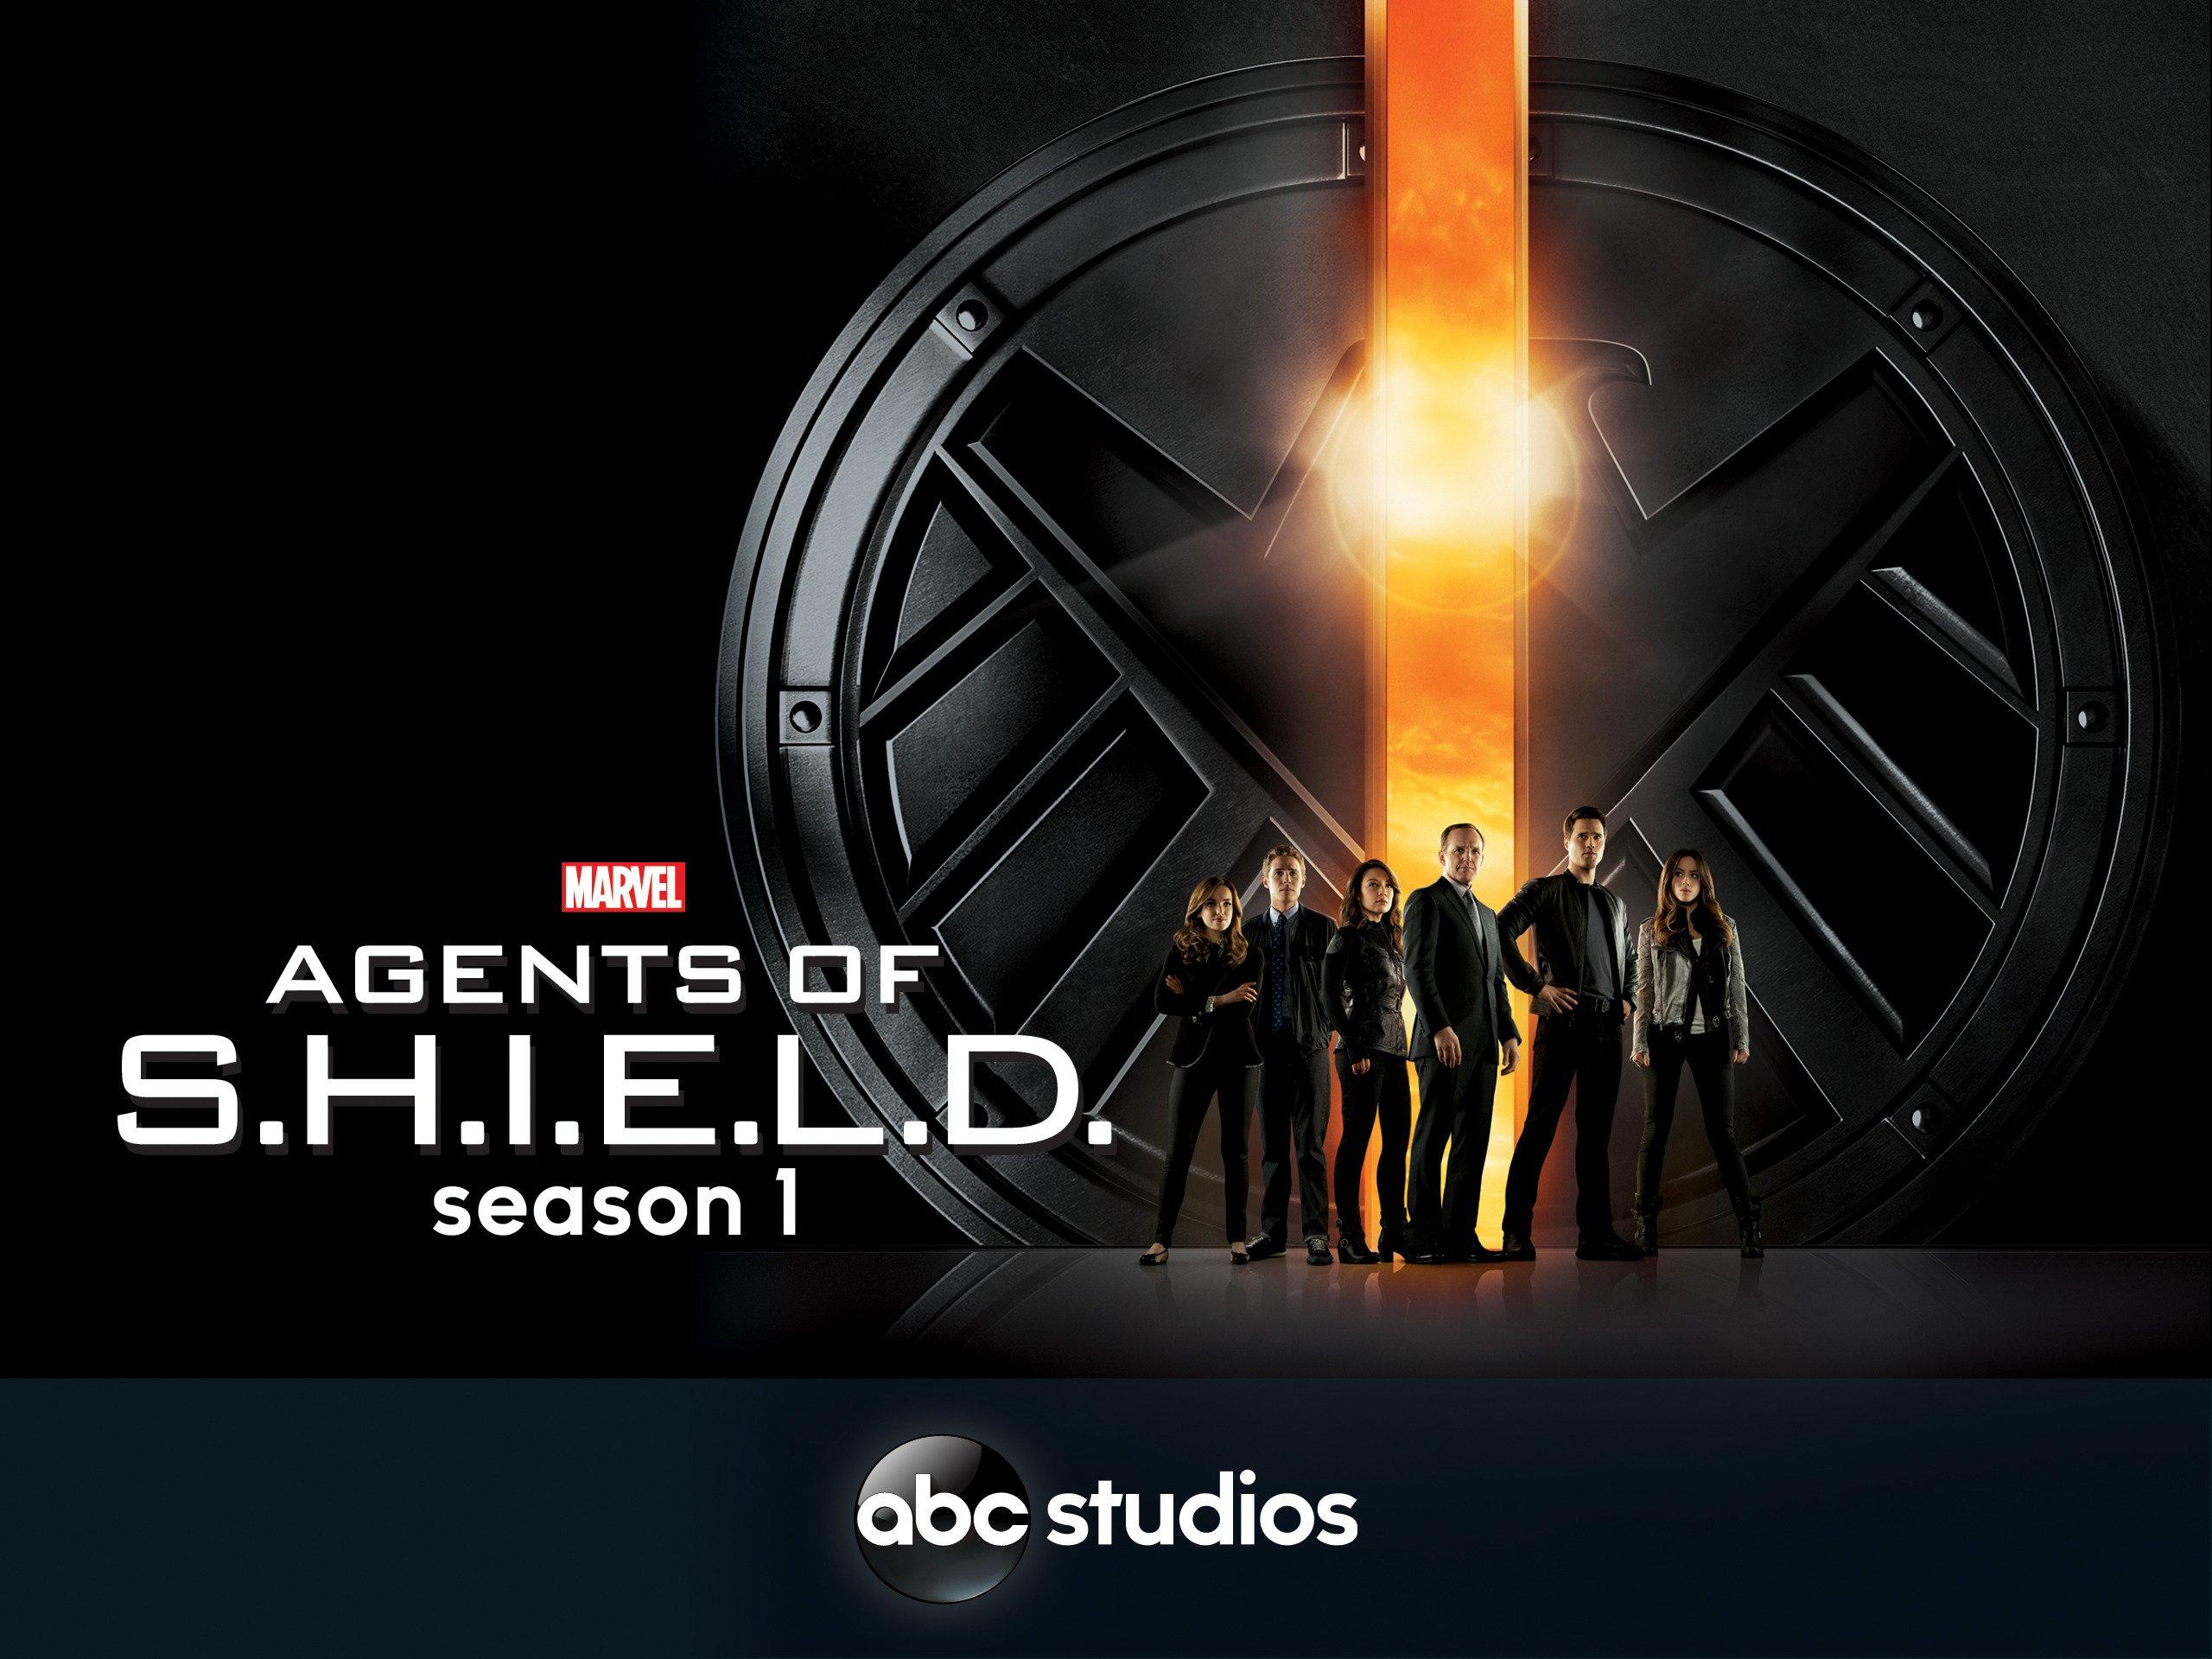 avengers assemble season 4 episode 21 dailymotion